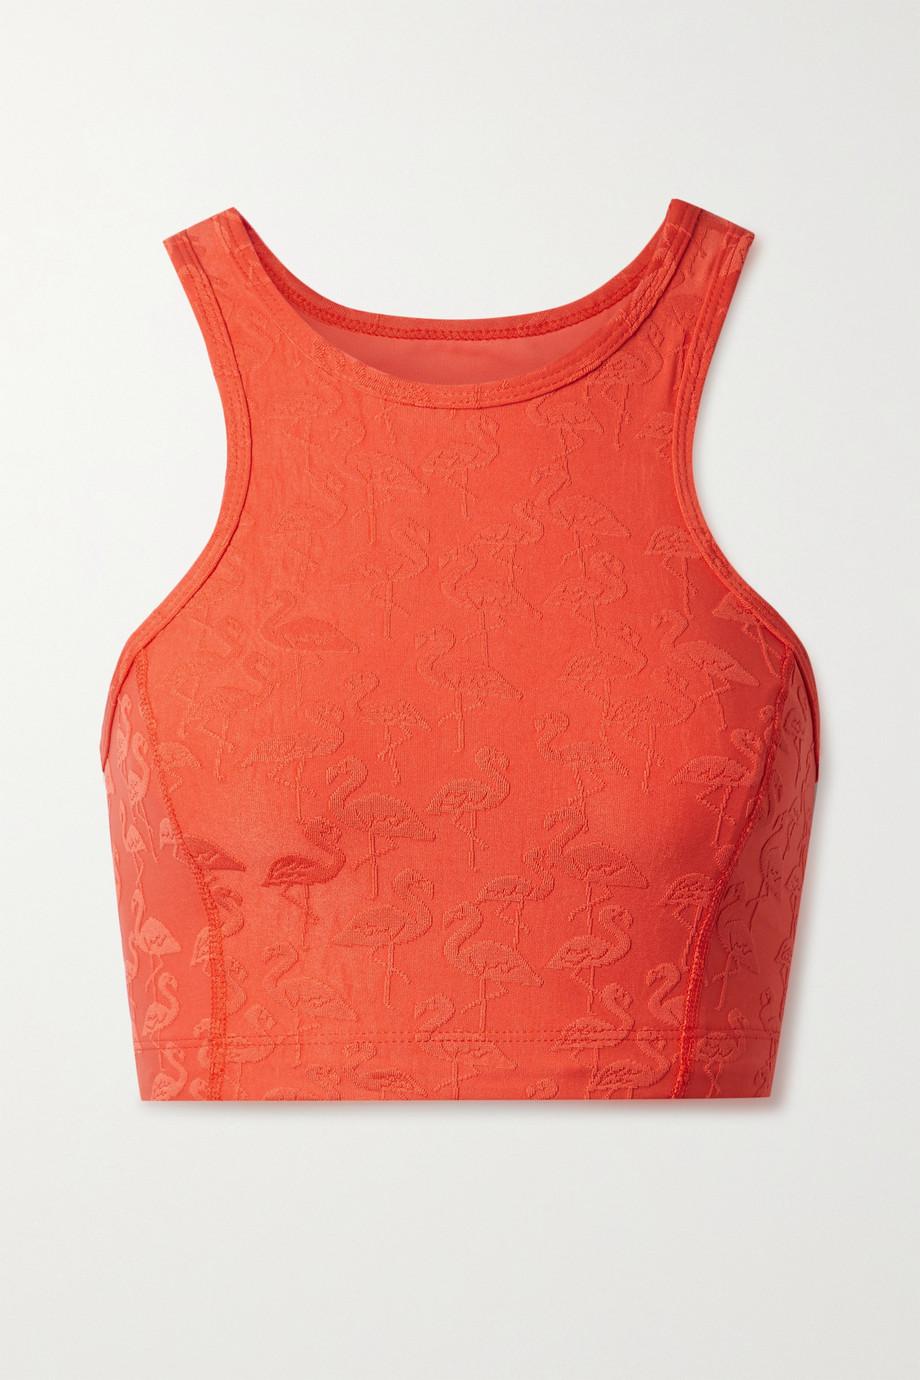 TWENTY Montréal Flamingo stretch-jacquard sports bra